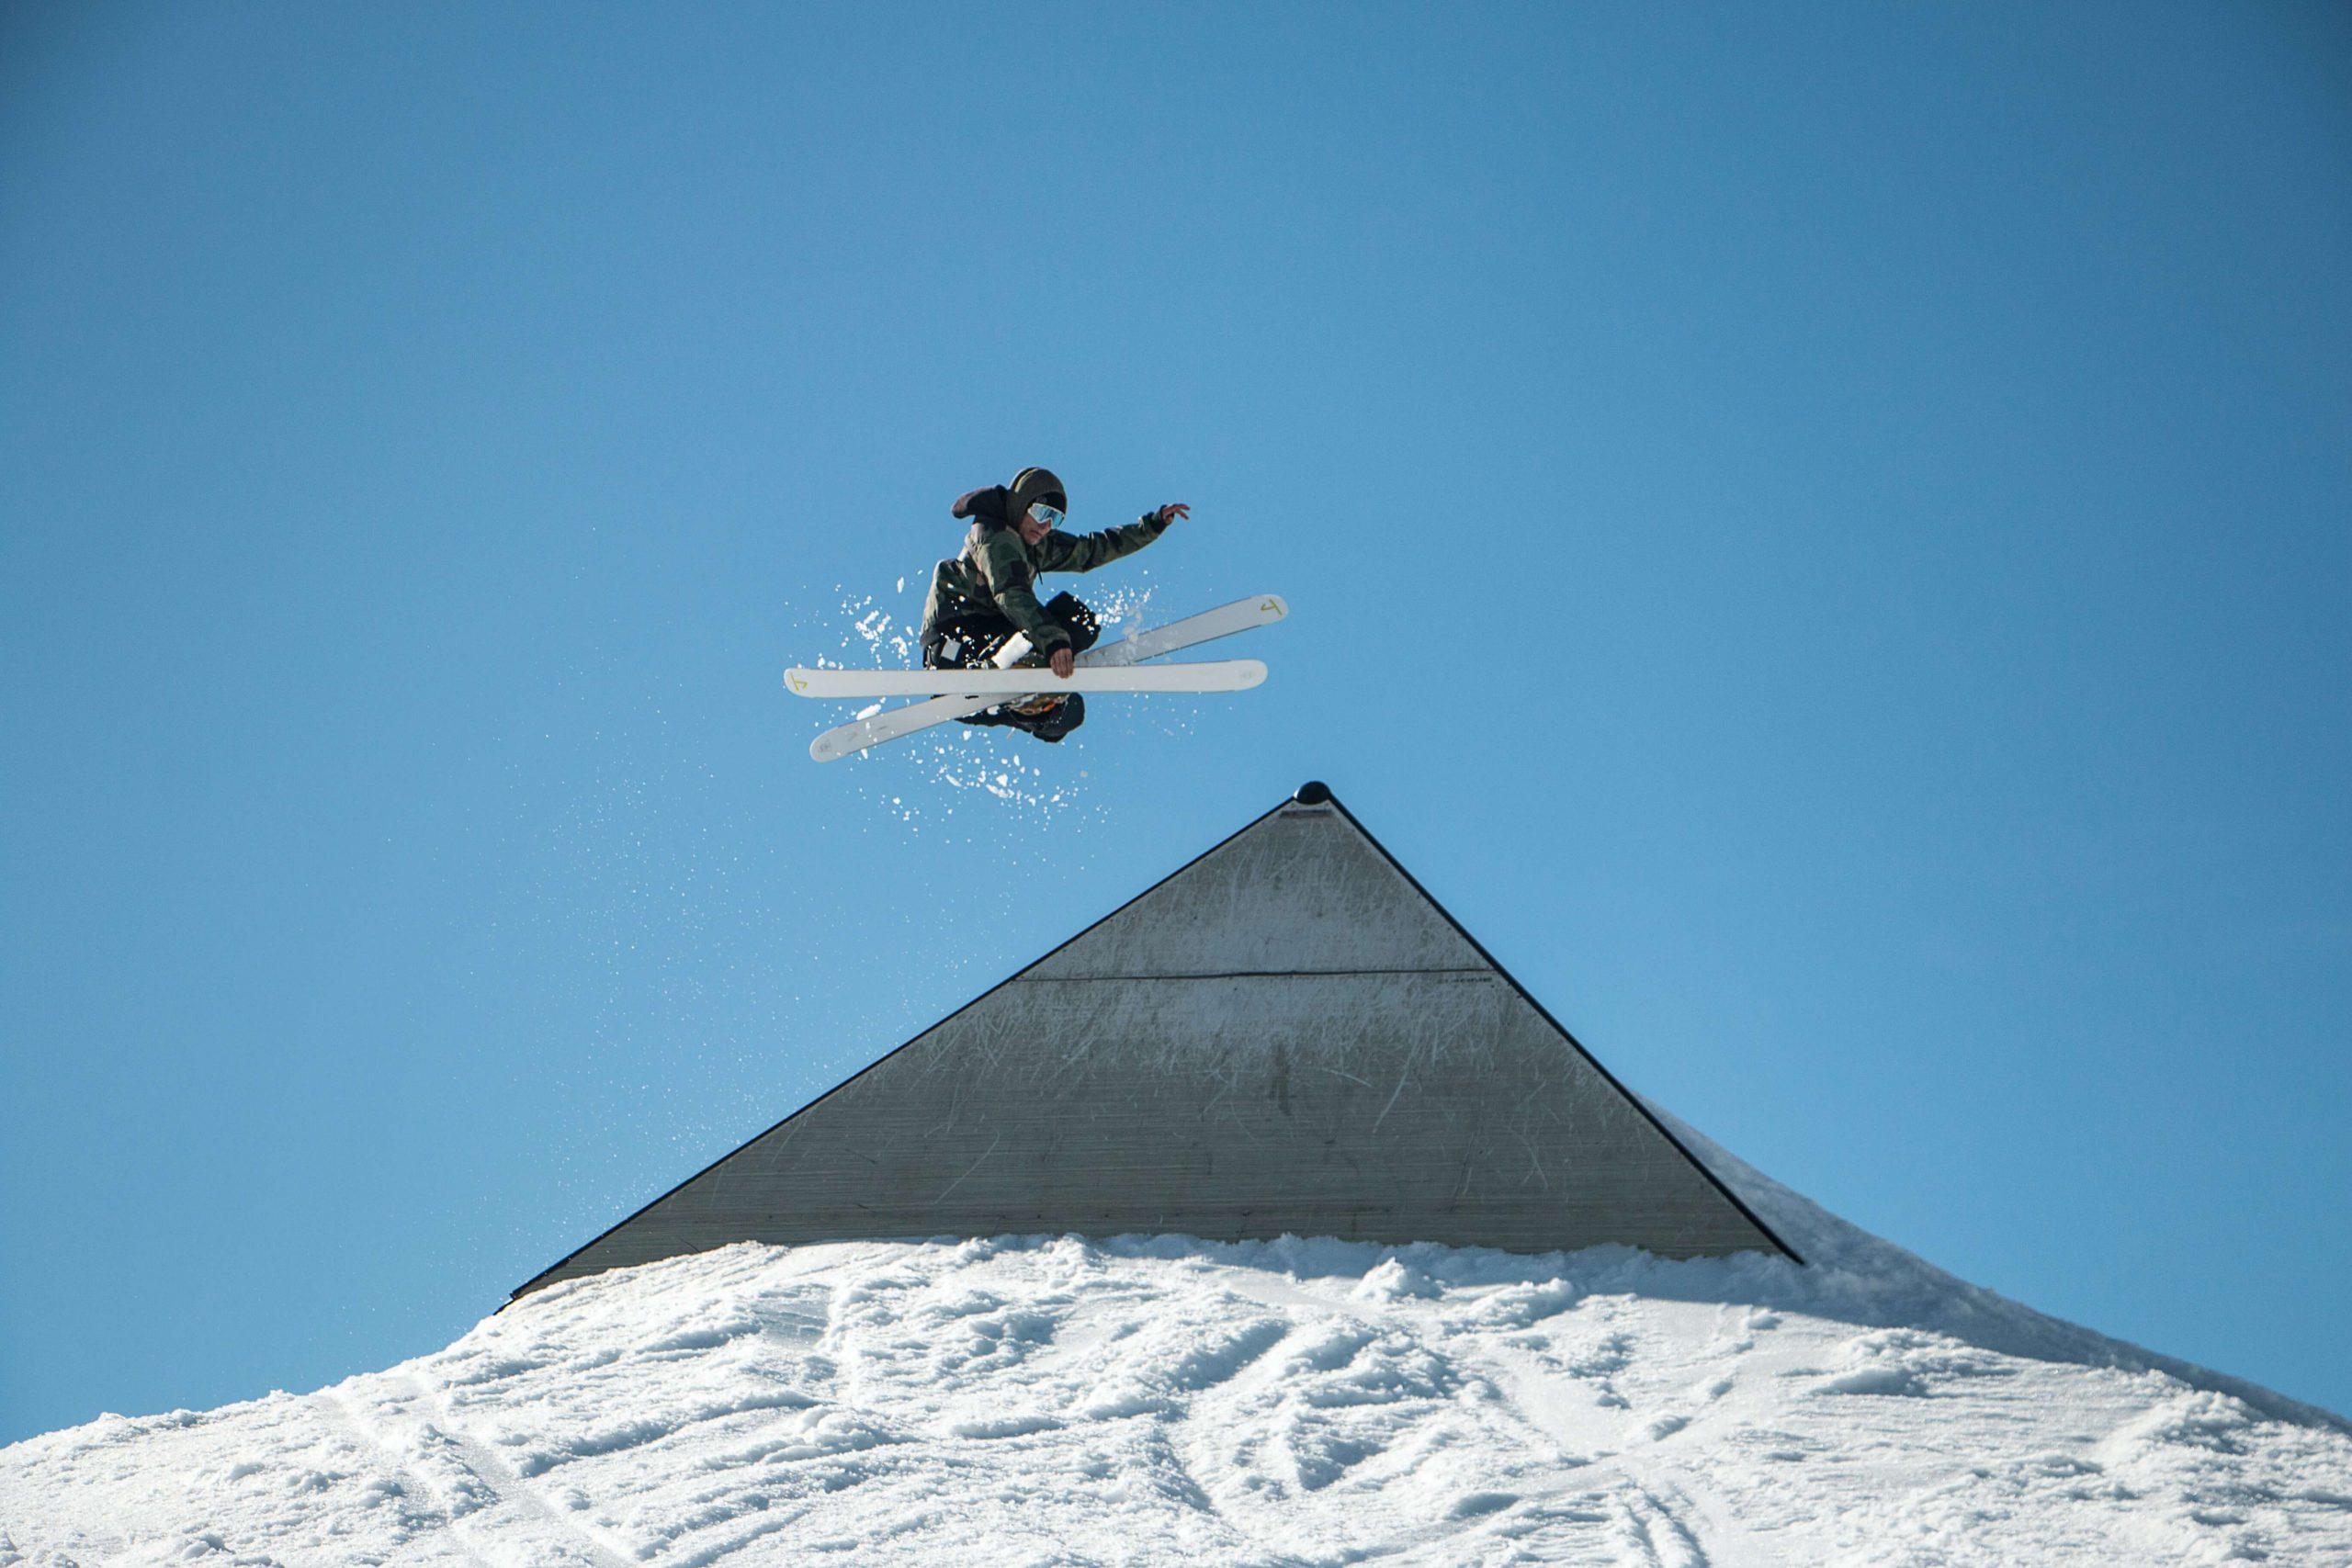 7 Top-Rated Ski Resorts in Switzerland, 2021